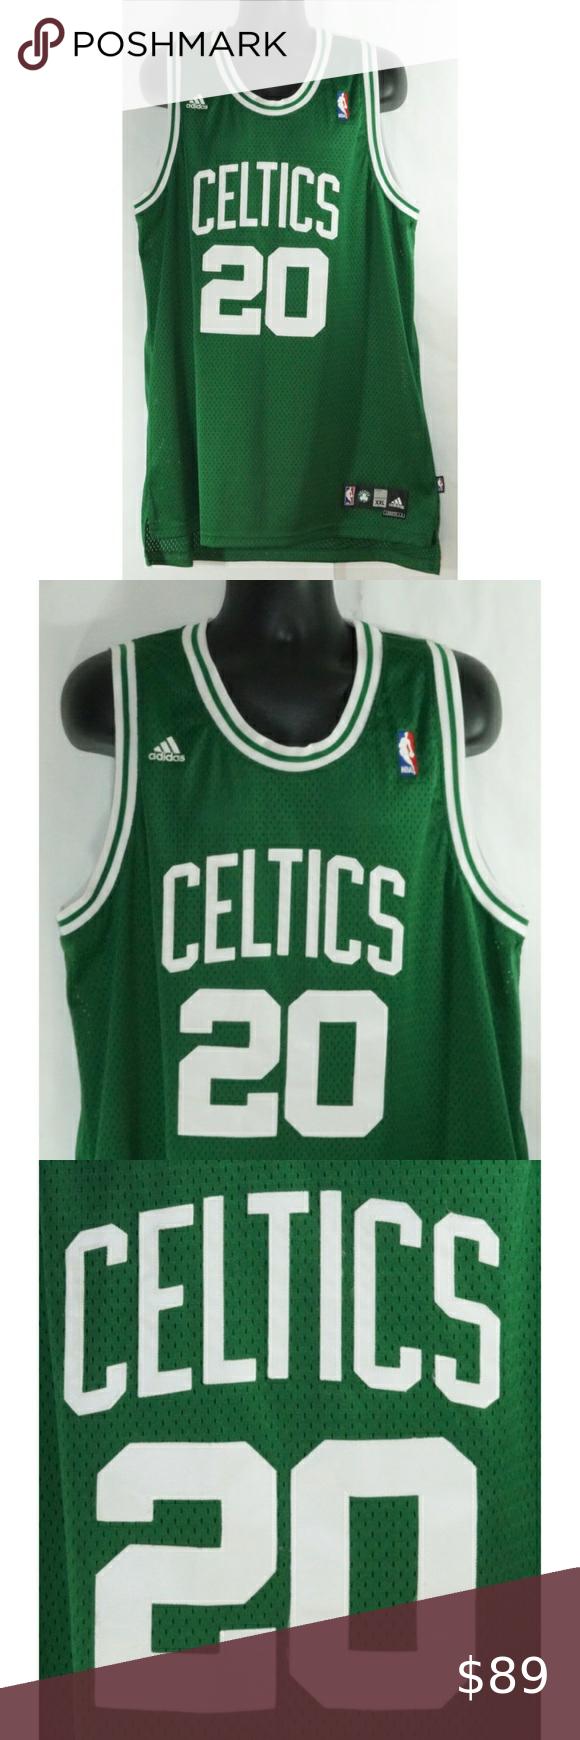 Ray Allen Boston Celtics Adidas Jersey Xxl Boston Celtics Ray Allen Nba Champions